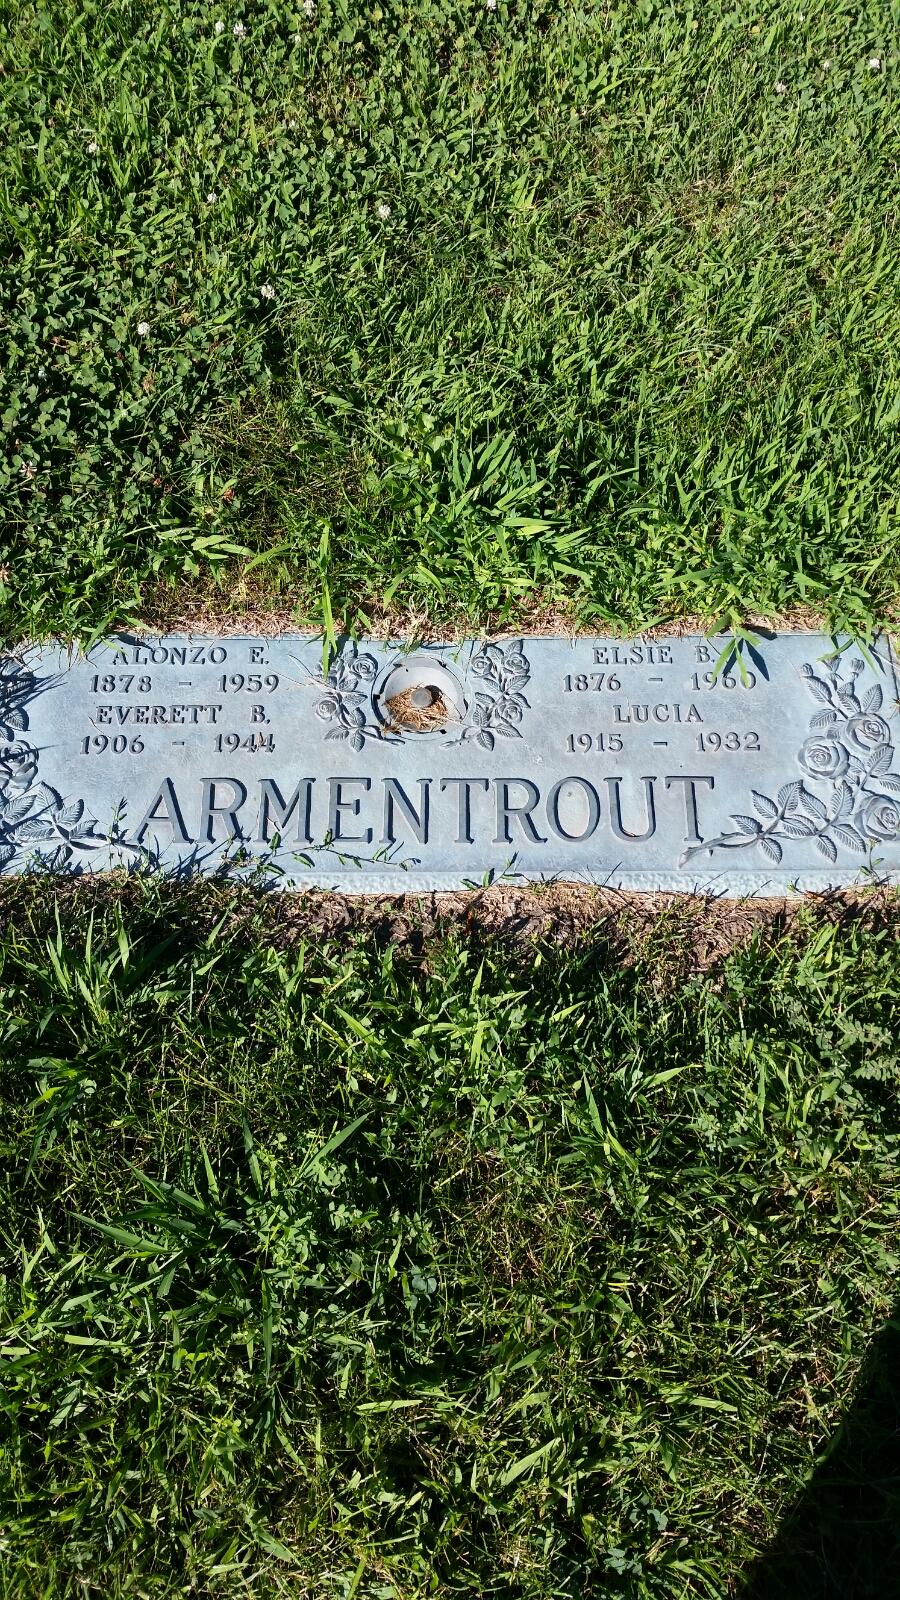 Everett Brown Armentrout